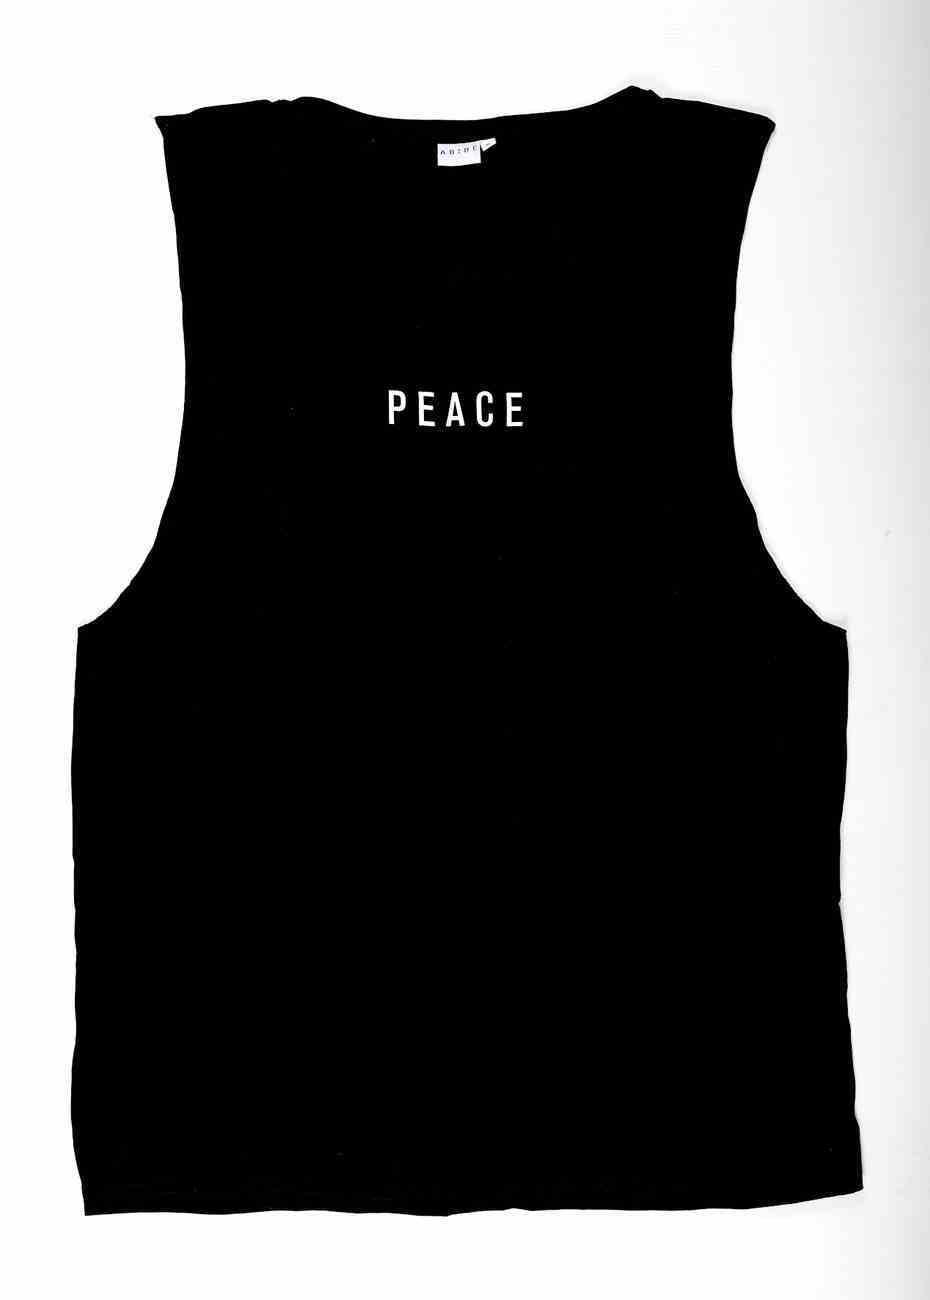 Mens Barnard Tank: Peace, Xxlarge, Black With White Print (Abide T-shirt Apparel Series) Soft Goods